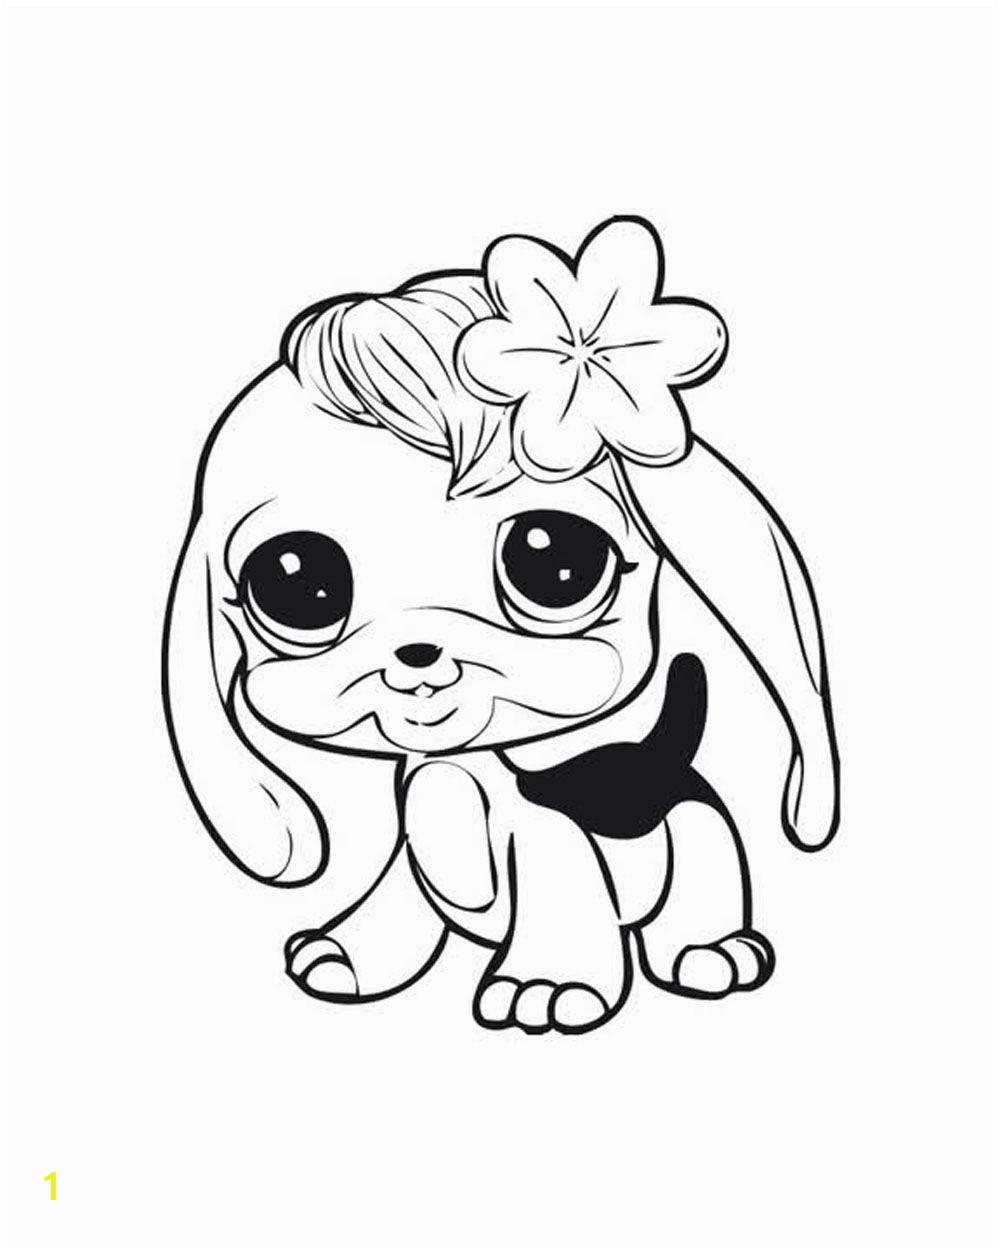 Littlest Pet Shop Printable Coloring Pages Littlest Pet Shops Coloring Page for My Kids